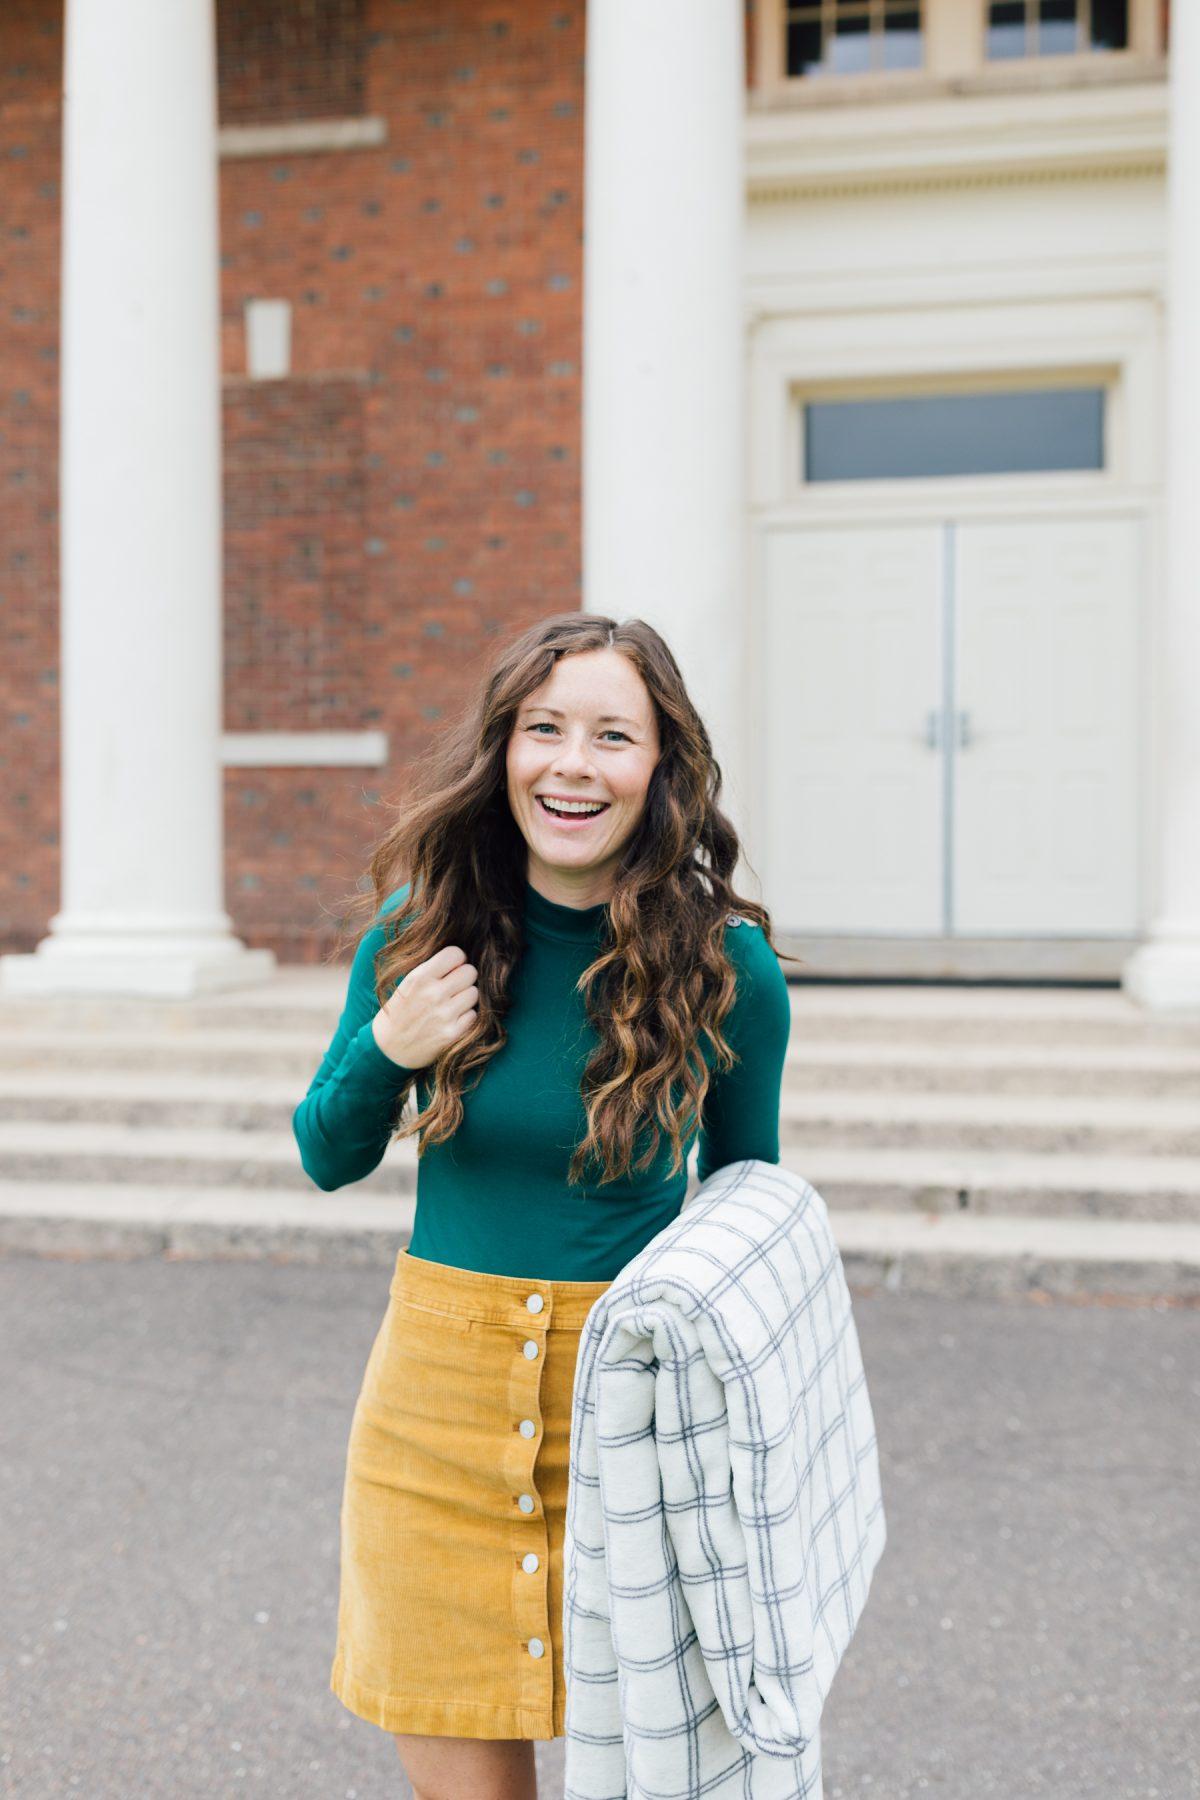 Green bodysuit, yellow corduroy skirt, chappy wrap blanket weekend outfit